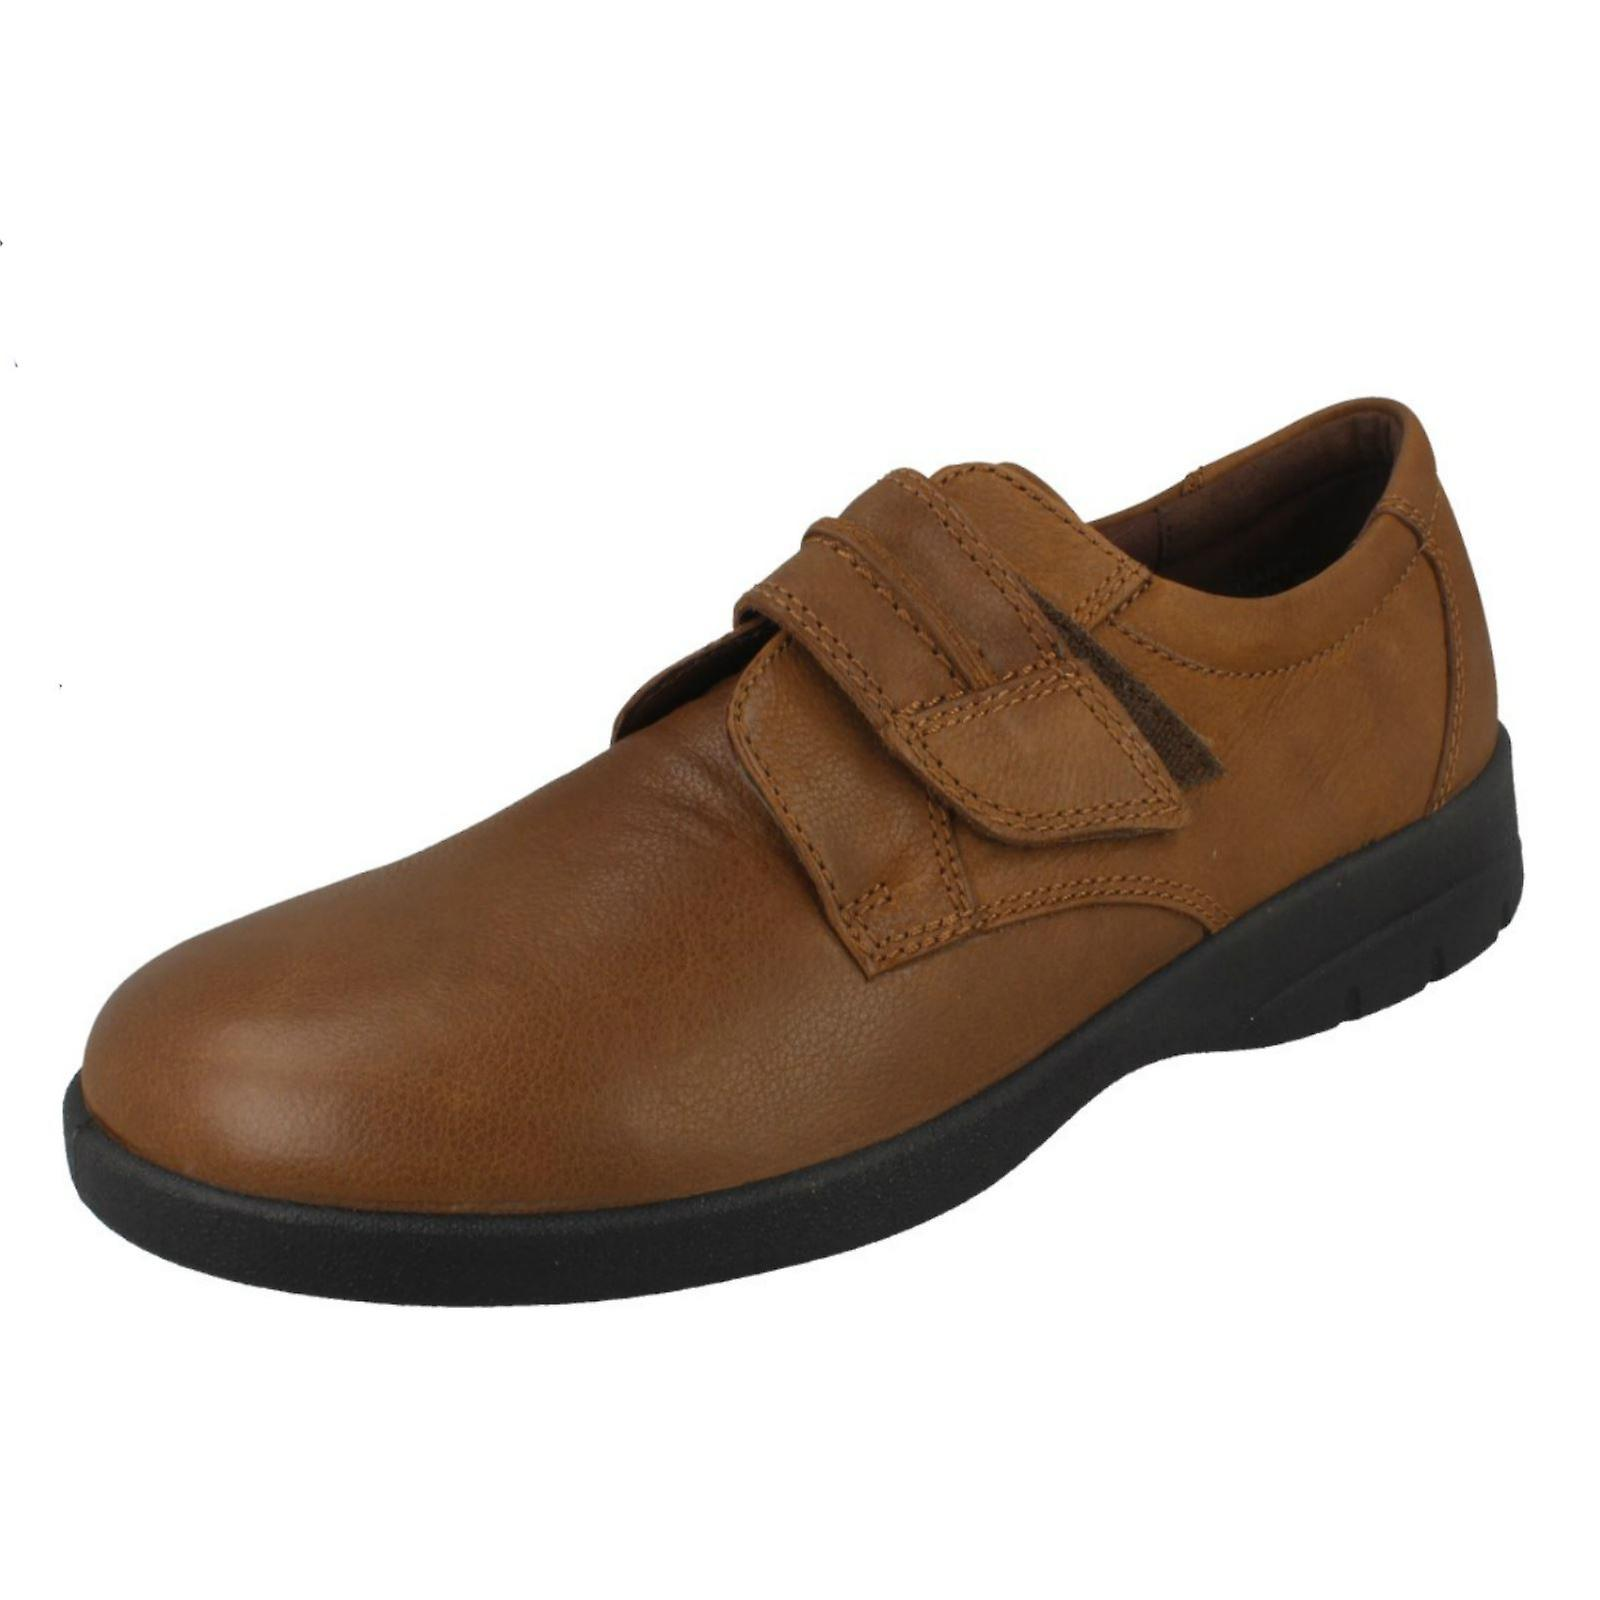 4e49c5f2fc200 s Padders Casual Shoes Shoes Shoes Gary a9021a - escarpins ...